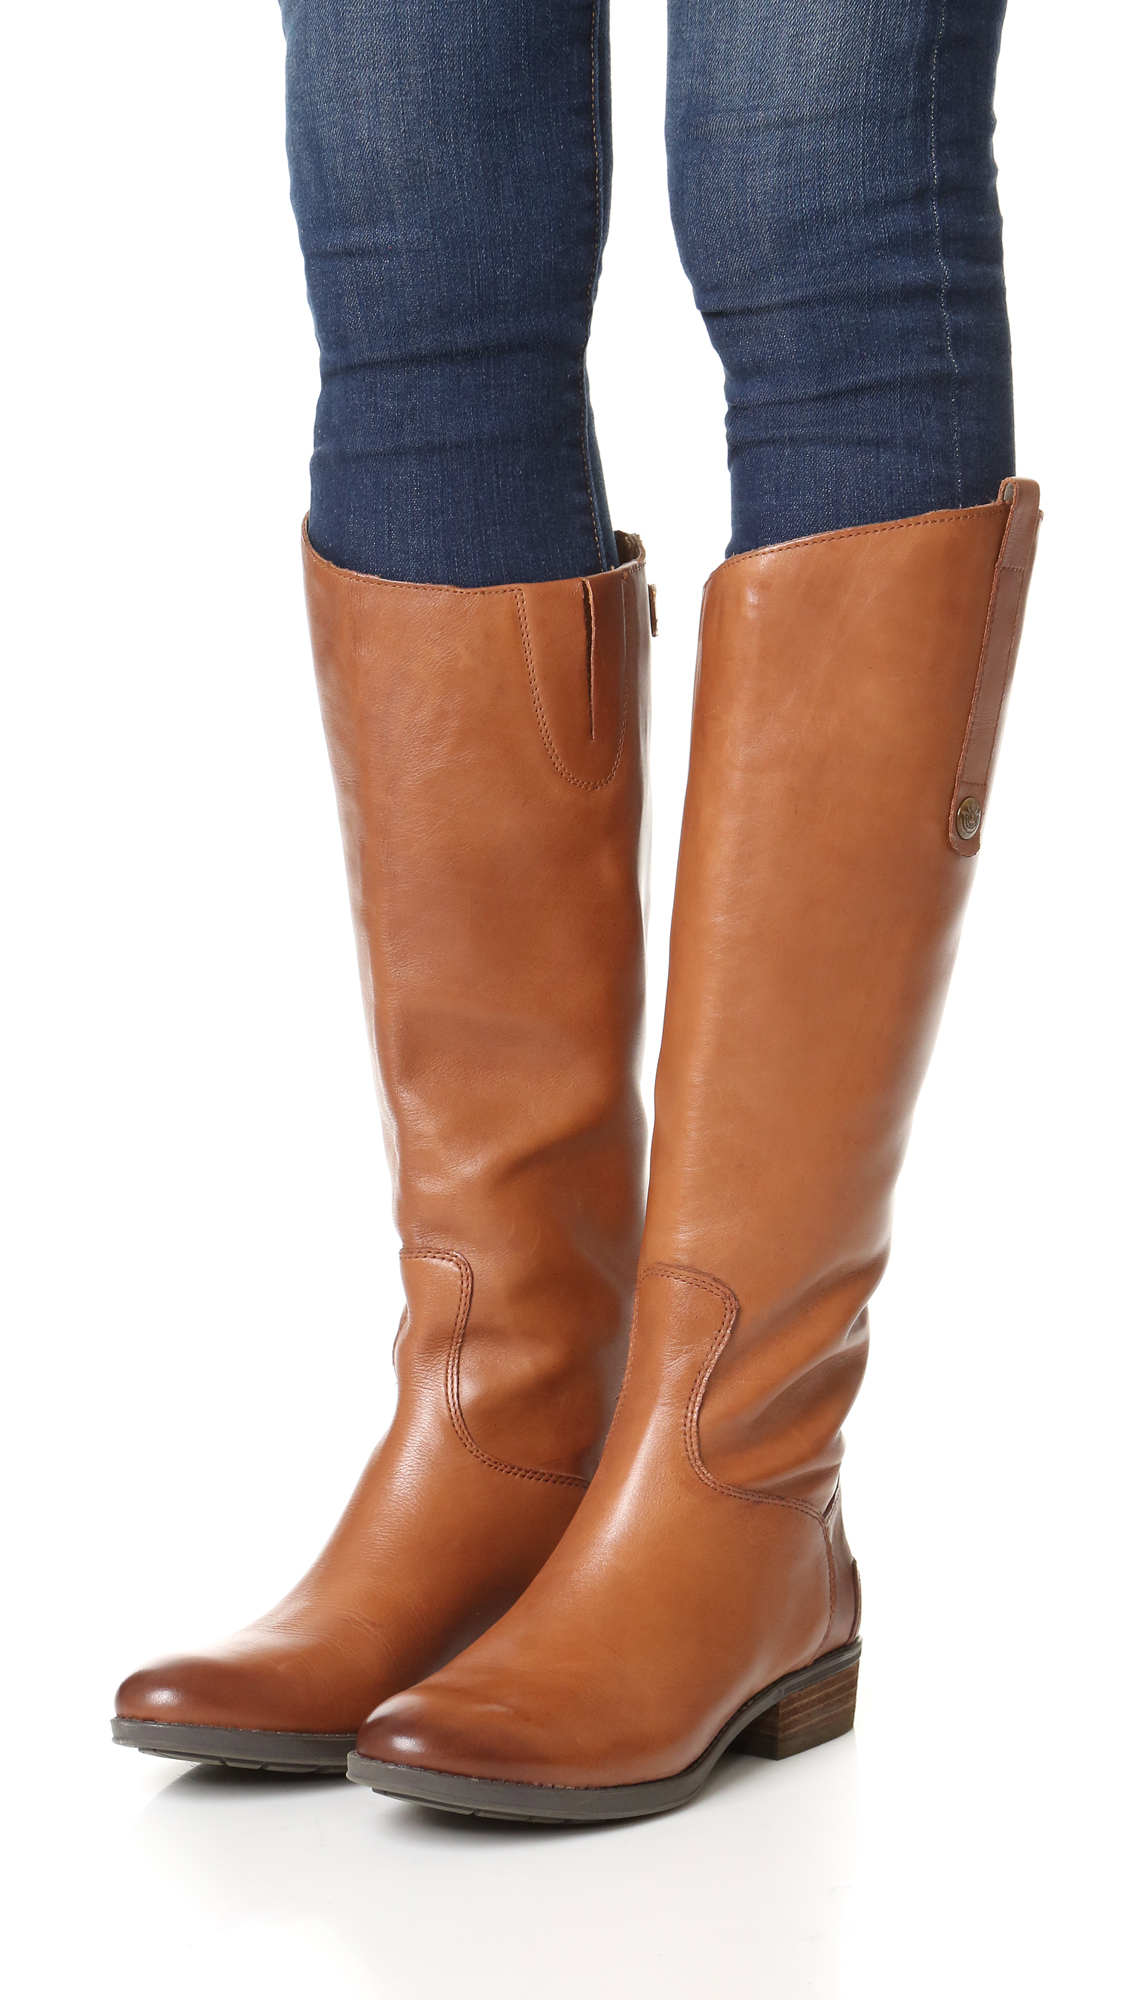 2d38f3a8111e4 Sam Edelman Penny Riding Boots